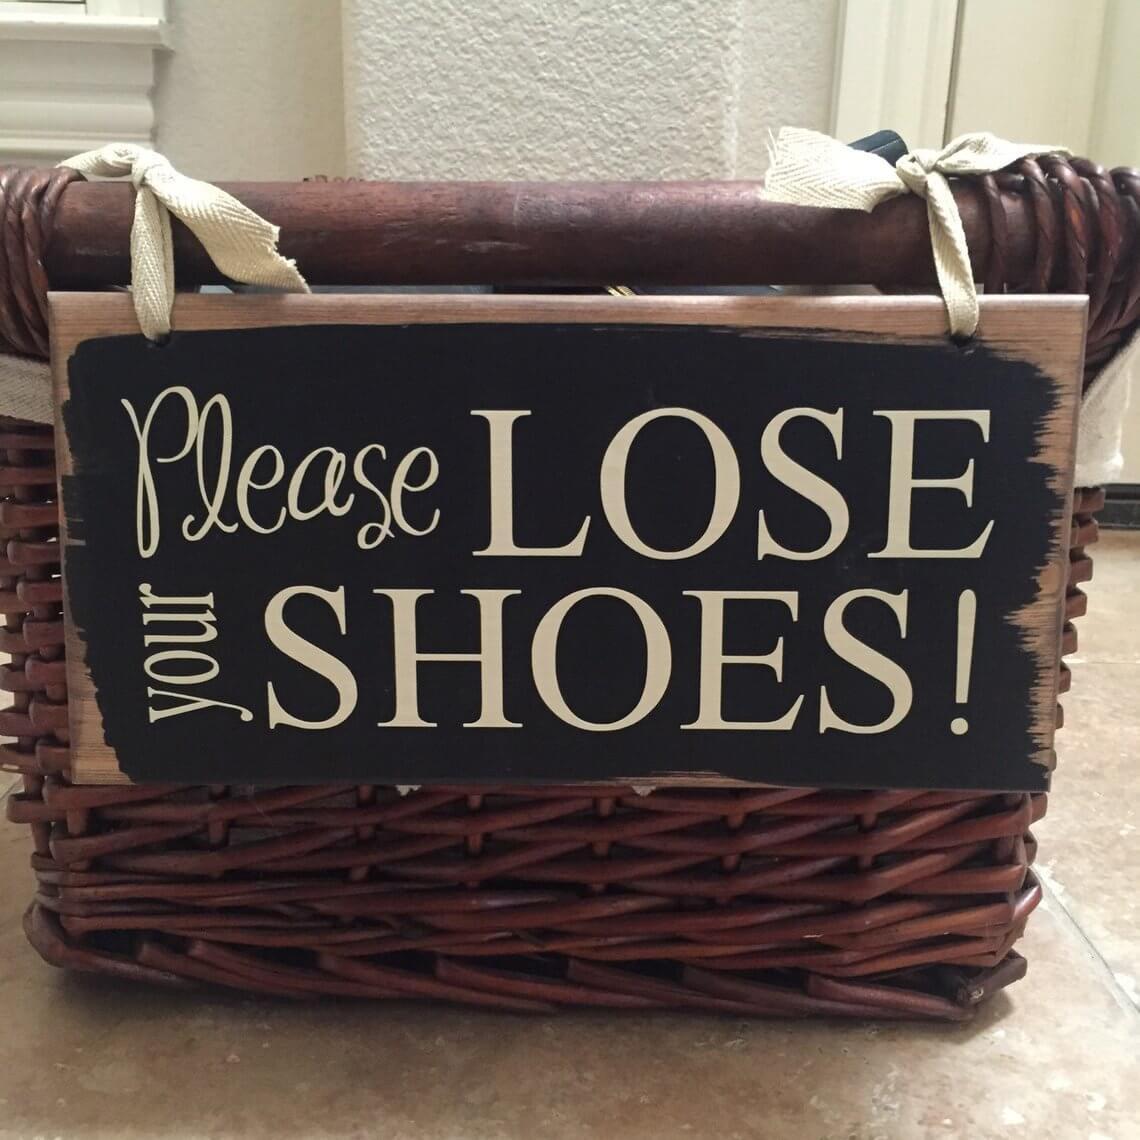 Dark Basket with Reminder Sign